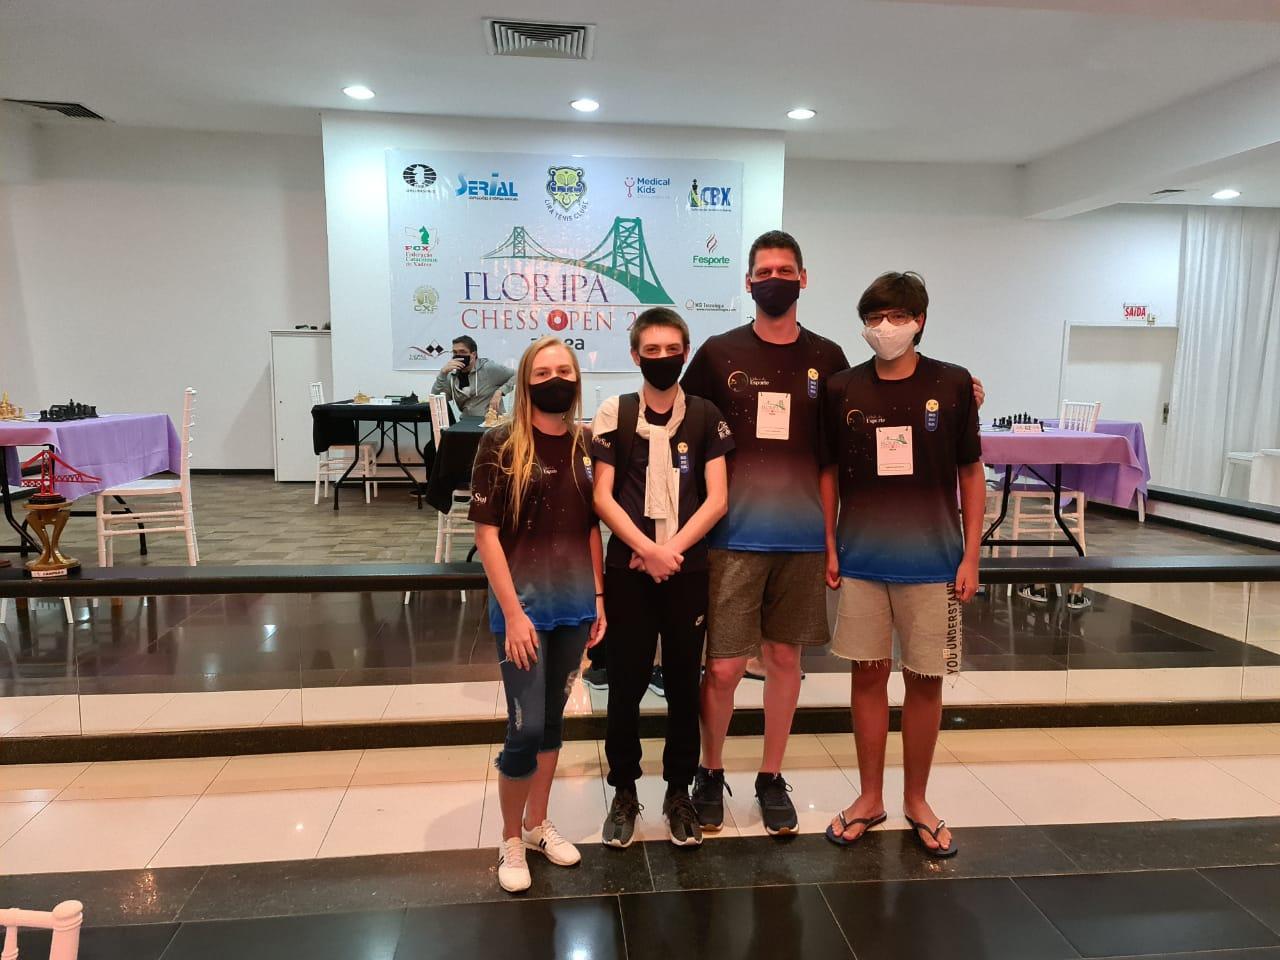 Enxadristas rio-sulenses disputaram Floripa Chess Open